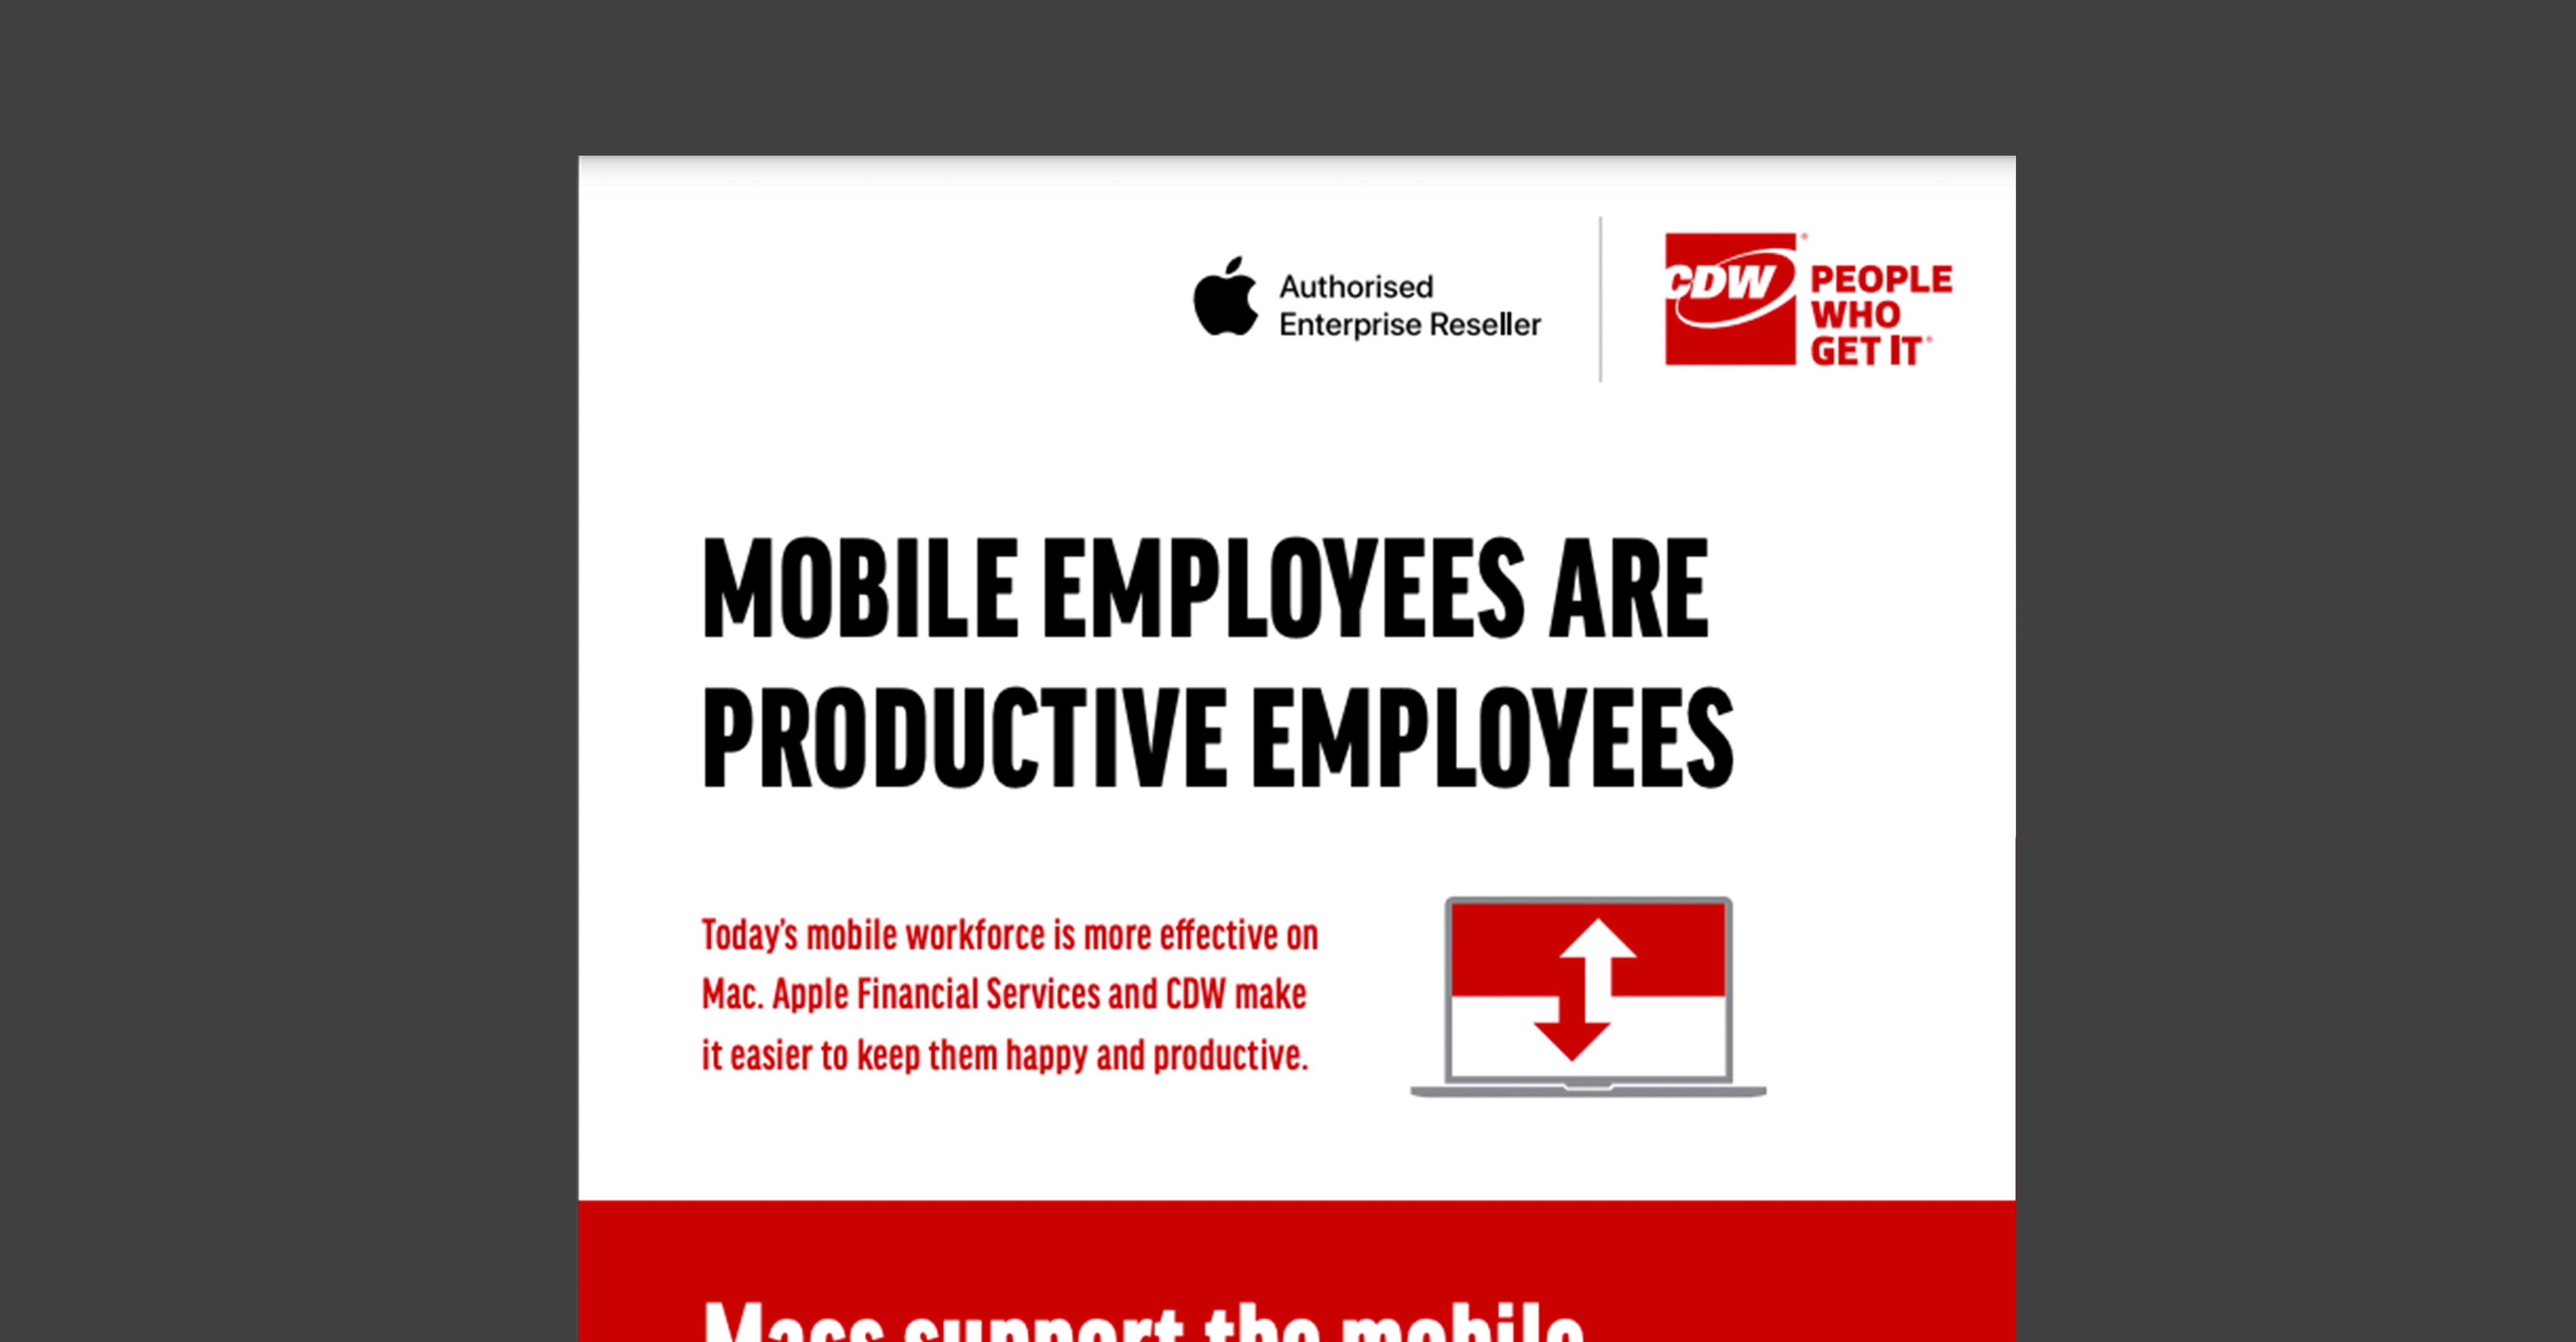 infographic image 1